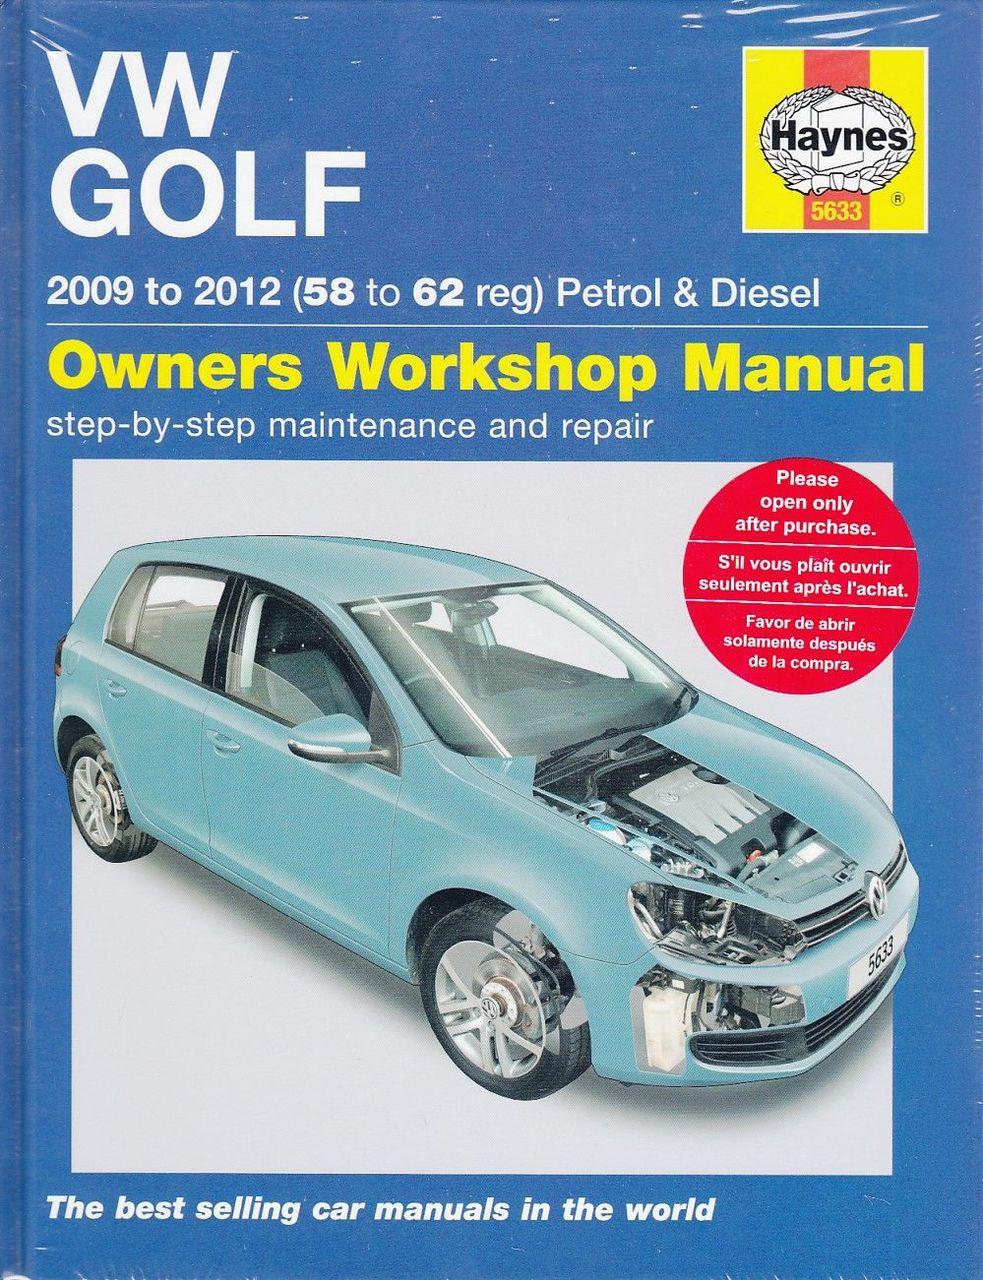 vw golf vi service manual best setting instruction guide u2022 rh merchanthelps us vw golf 6 owners manual vw golf vi service manual